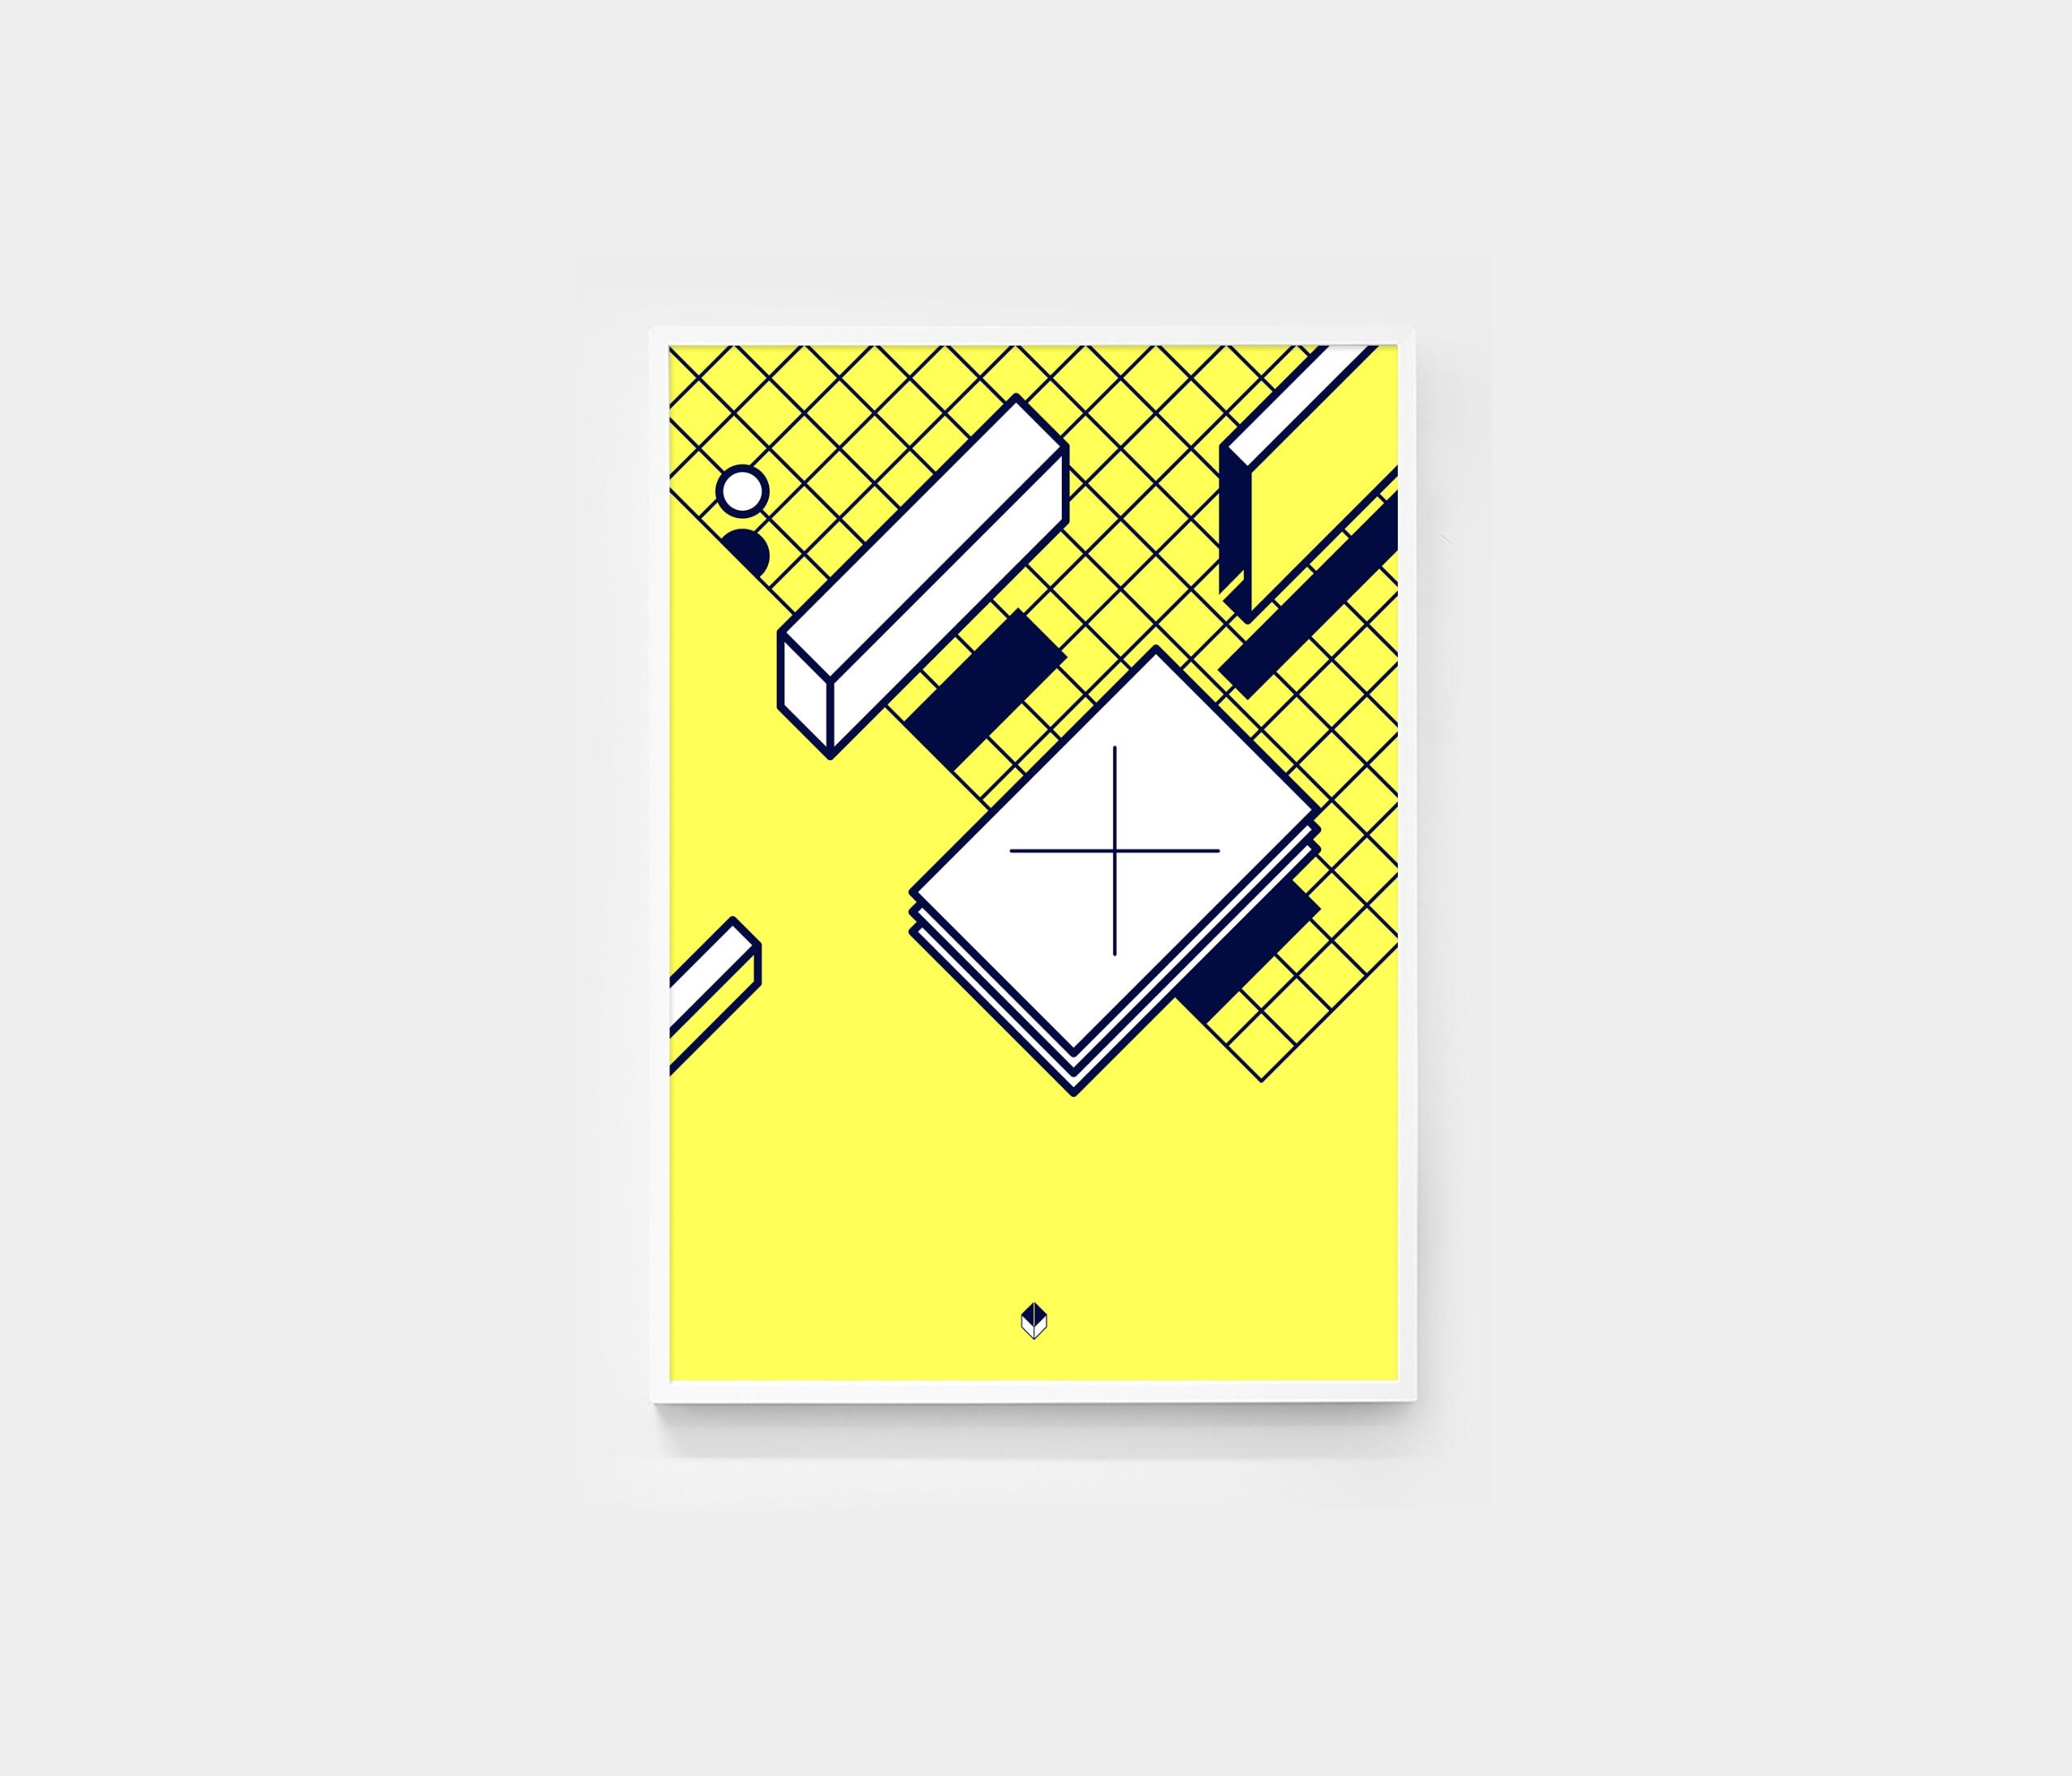 Square 3 - artwork,, design,, shapes, - andrebritz | ello